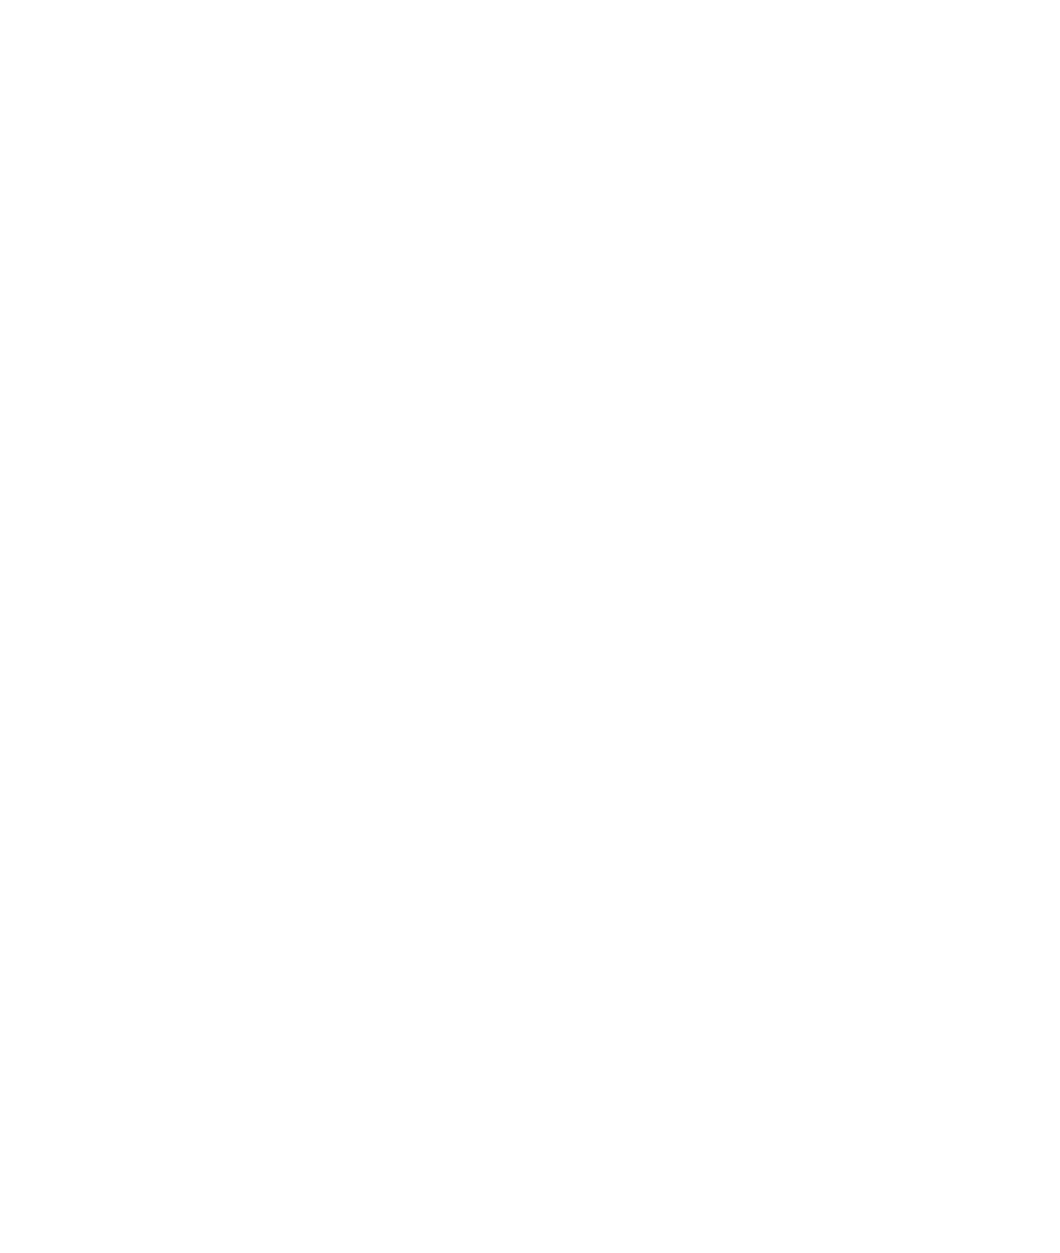 MW2145300 Pullover aus Bouclé Strick | Liebeskind Berlin DOB